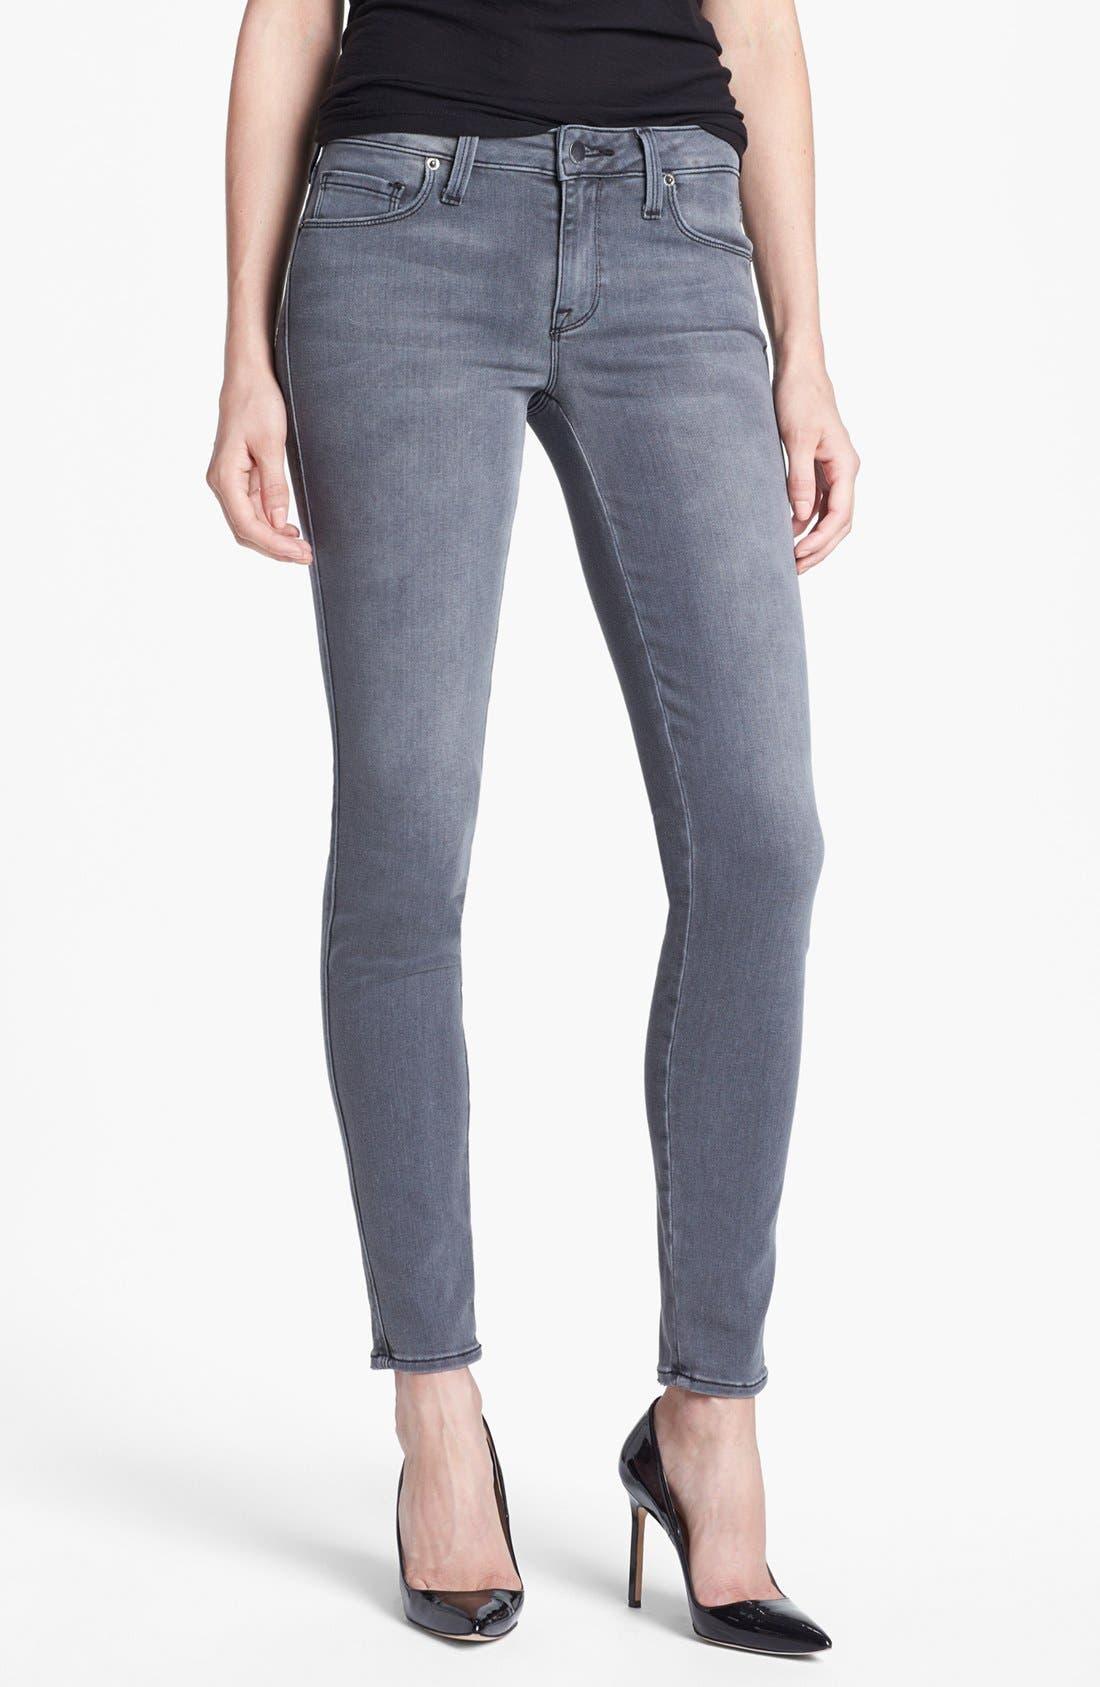 Alternate Image 1 Selected - Genetic 'Shya' Cigarette Skinny Jeans (Gaze)